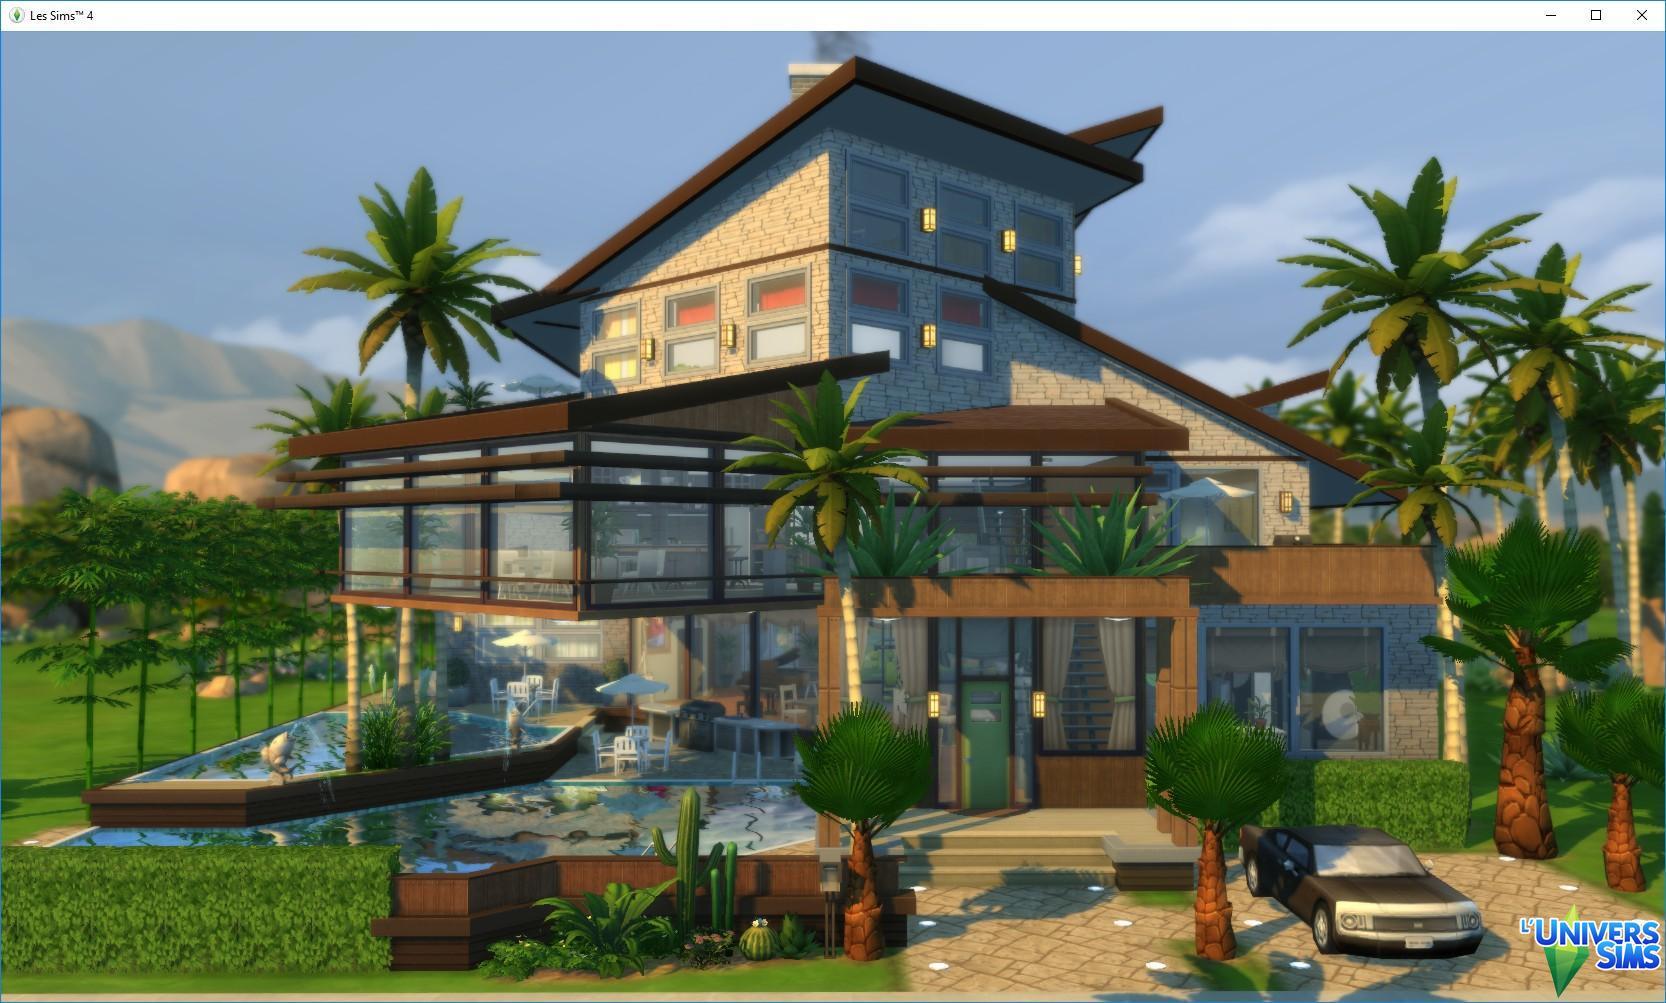 Maison Les Sims 4 Gamboahinestrosa